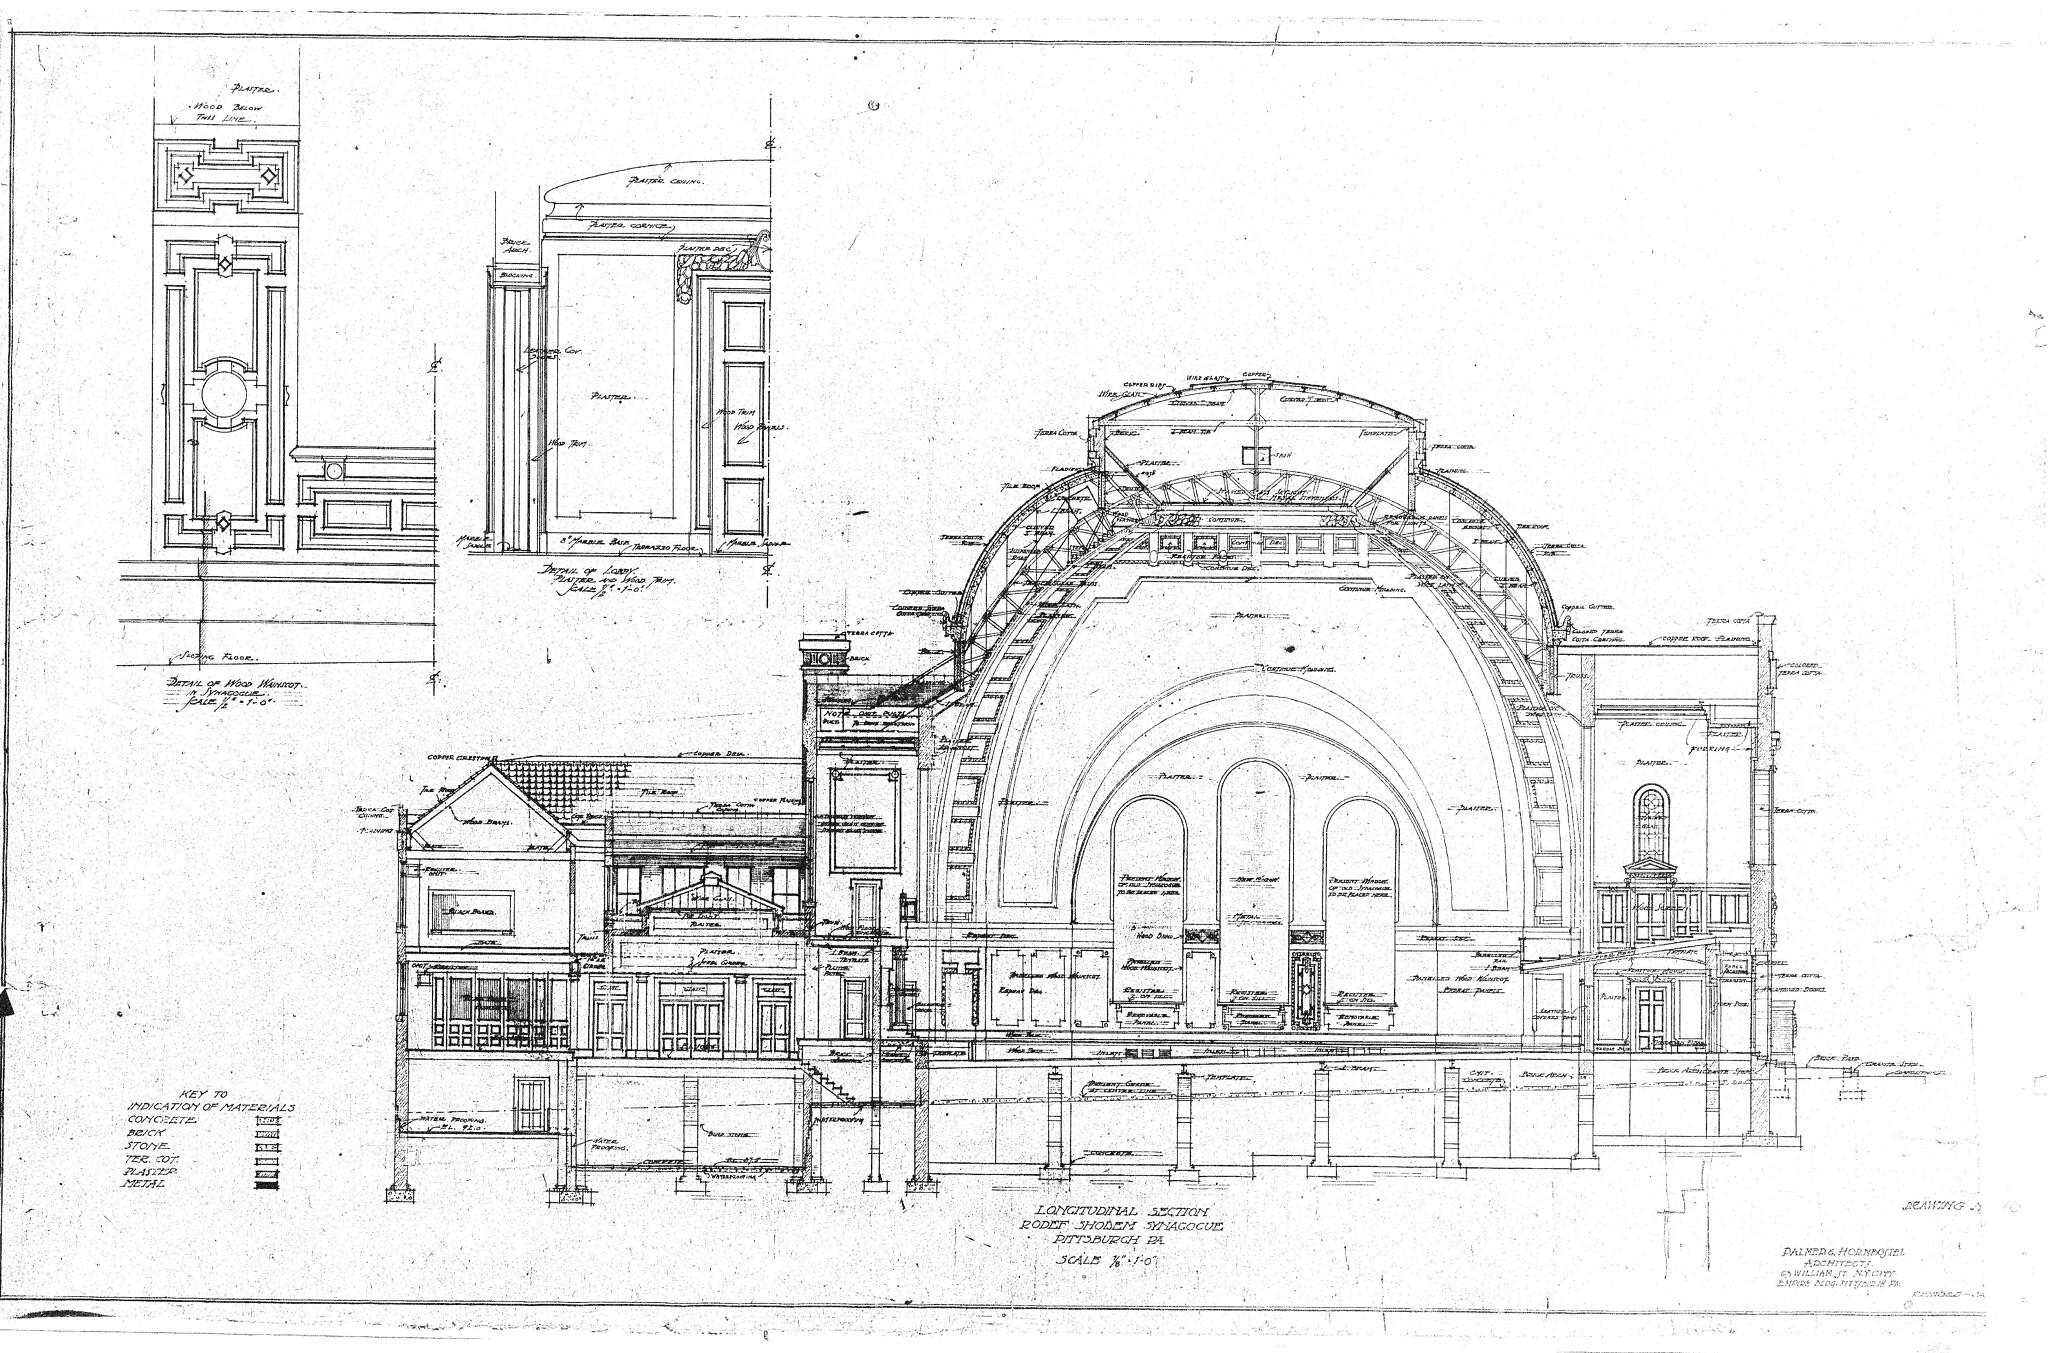 Historic drawings of Rodef Shalom Congregation. Palmer & Hornbostel Longitudinal Section. Image courtesy of Matthew Falcone